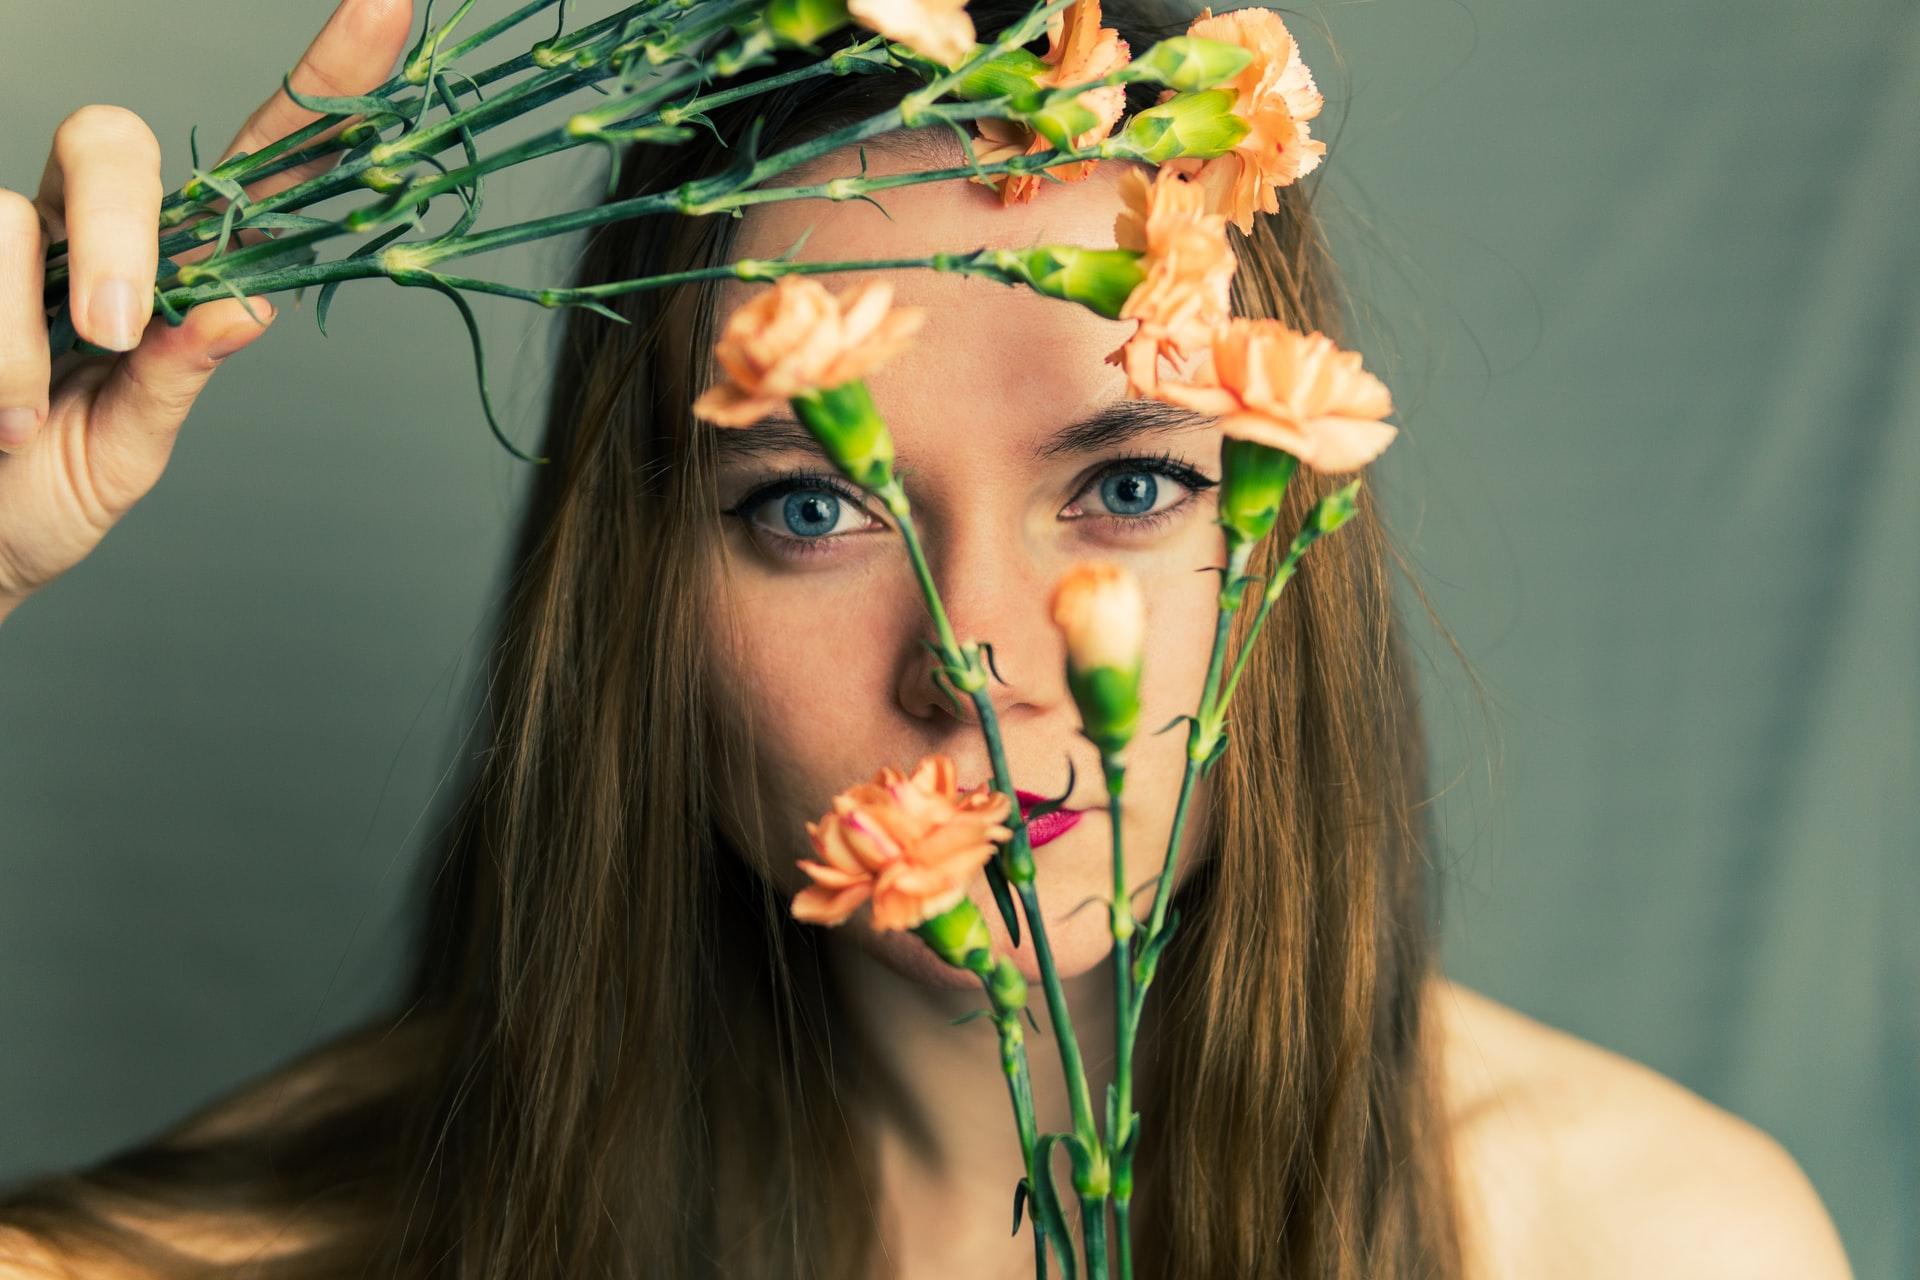 5 Rahasia Tentang Tanam Bulu Mata yang Tidak Kamu Ketahui